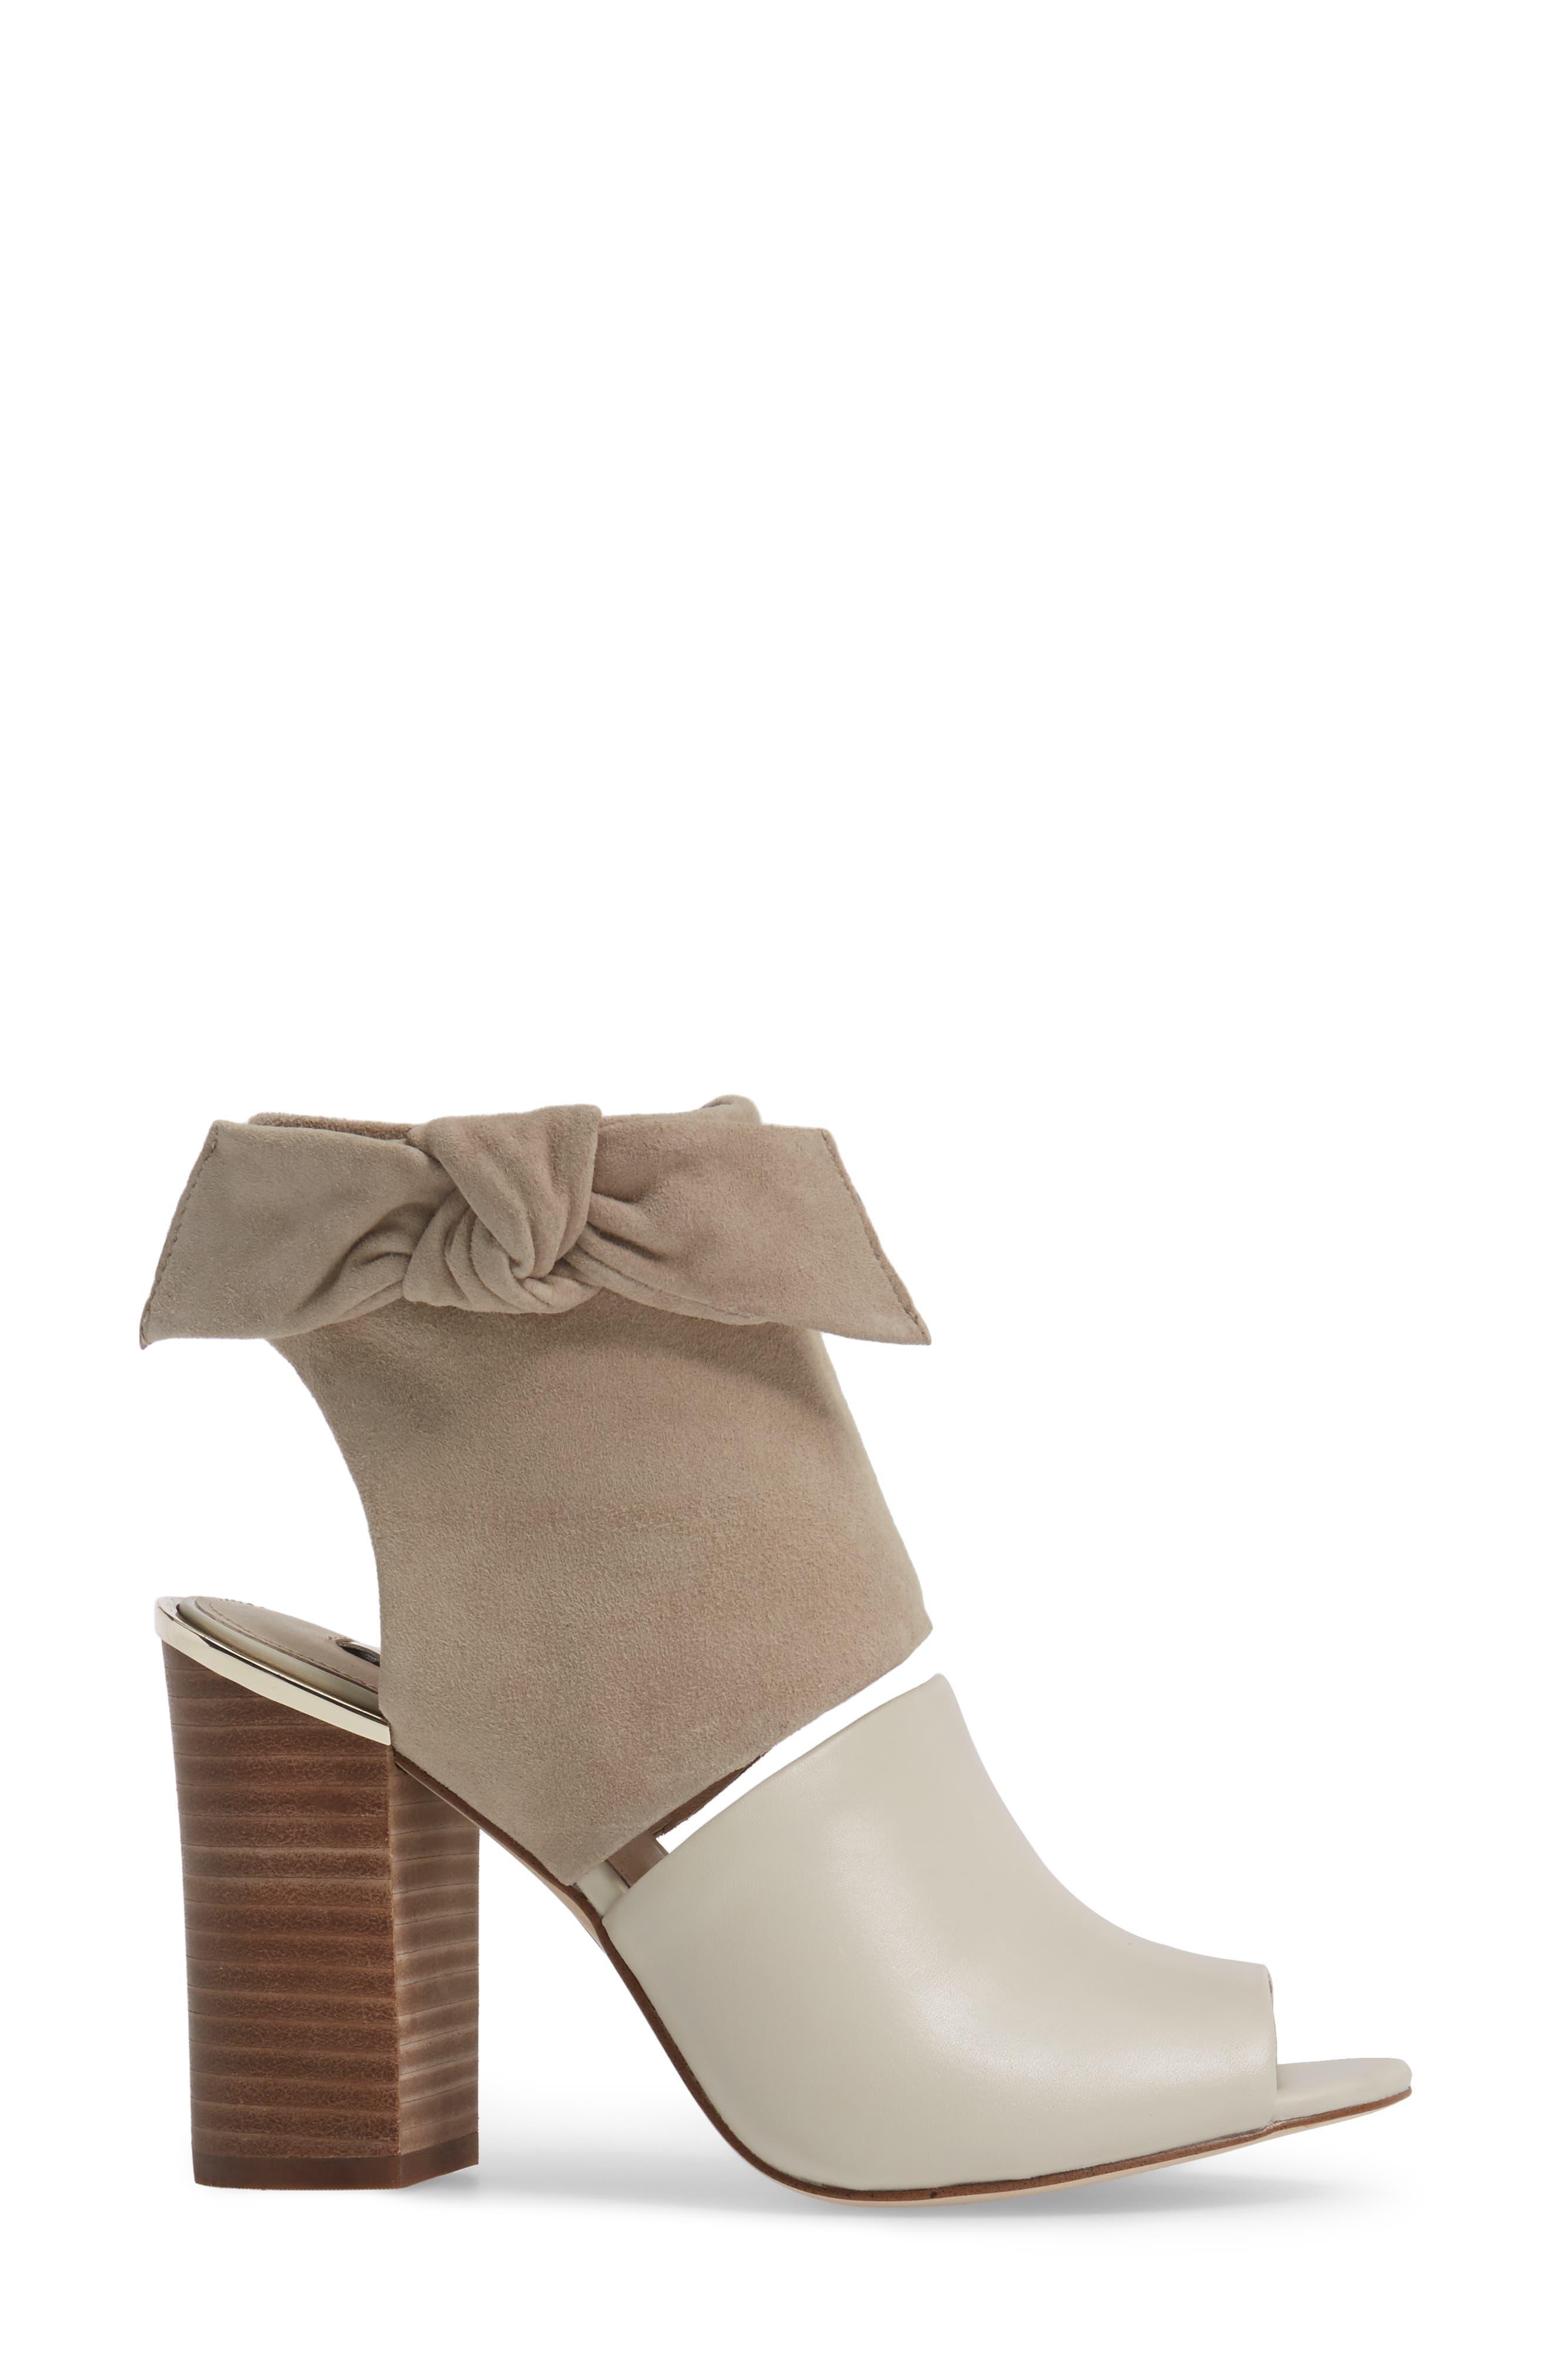 Alternate Image 3  - Louise et Cit Katlin Block Heel Sandal (Women)